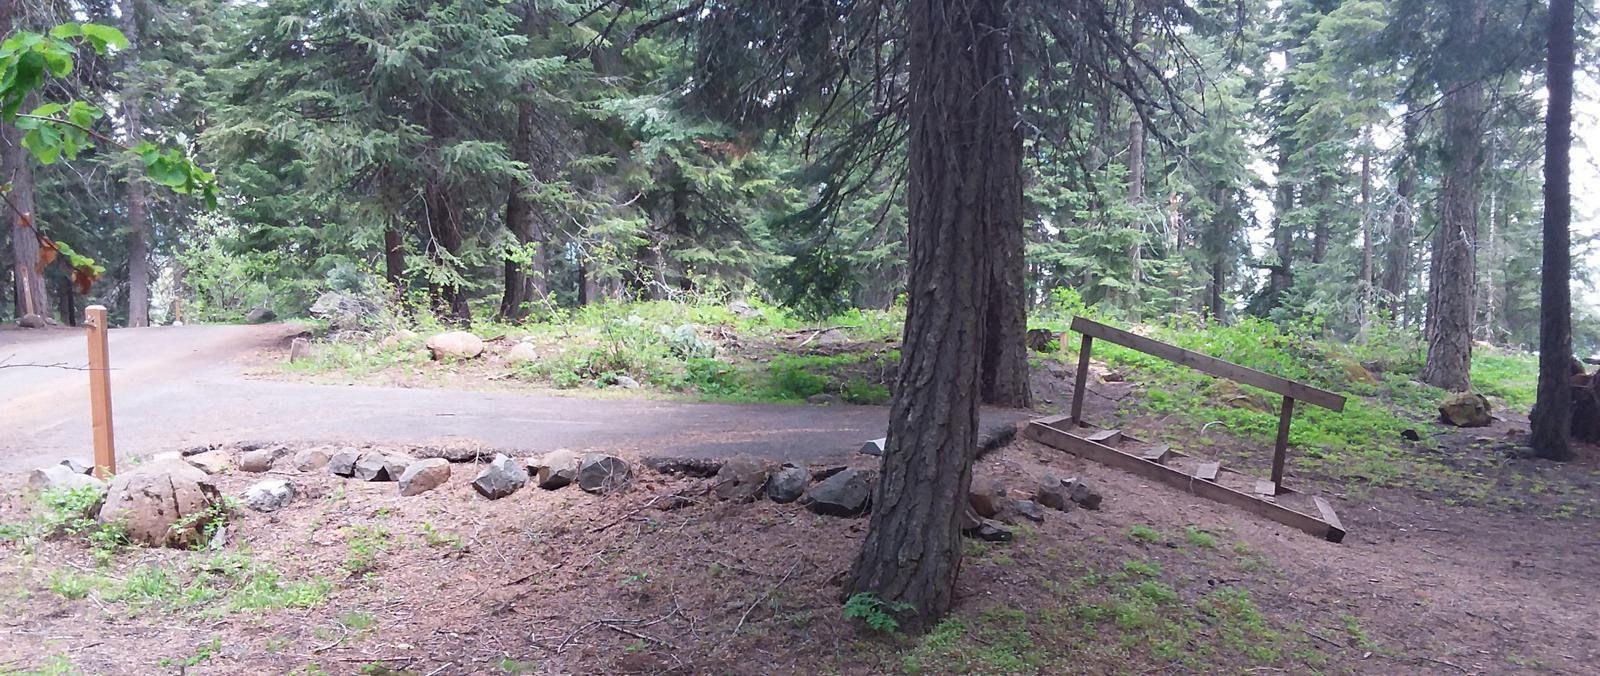 Campsite A13- Hyatt LakeCampsite 13, A Loop Hyatt Lake